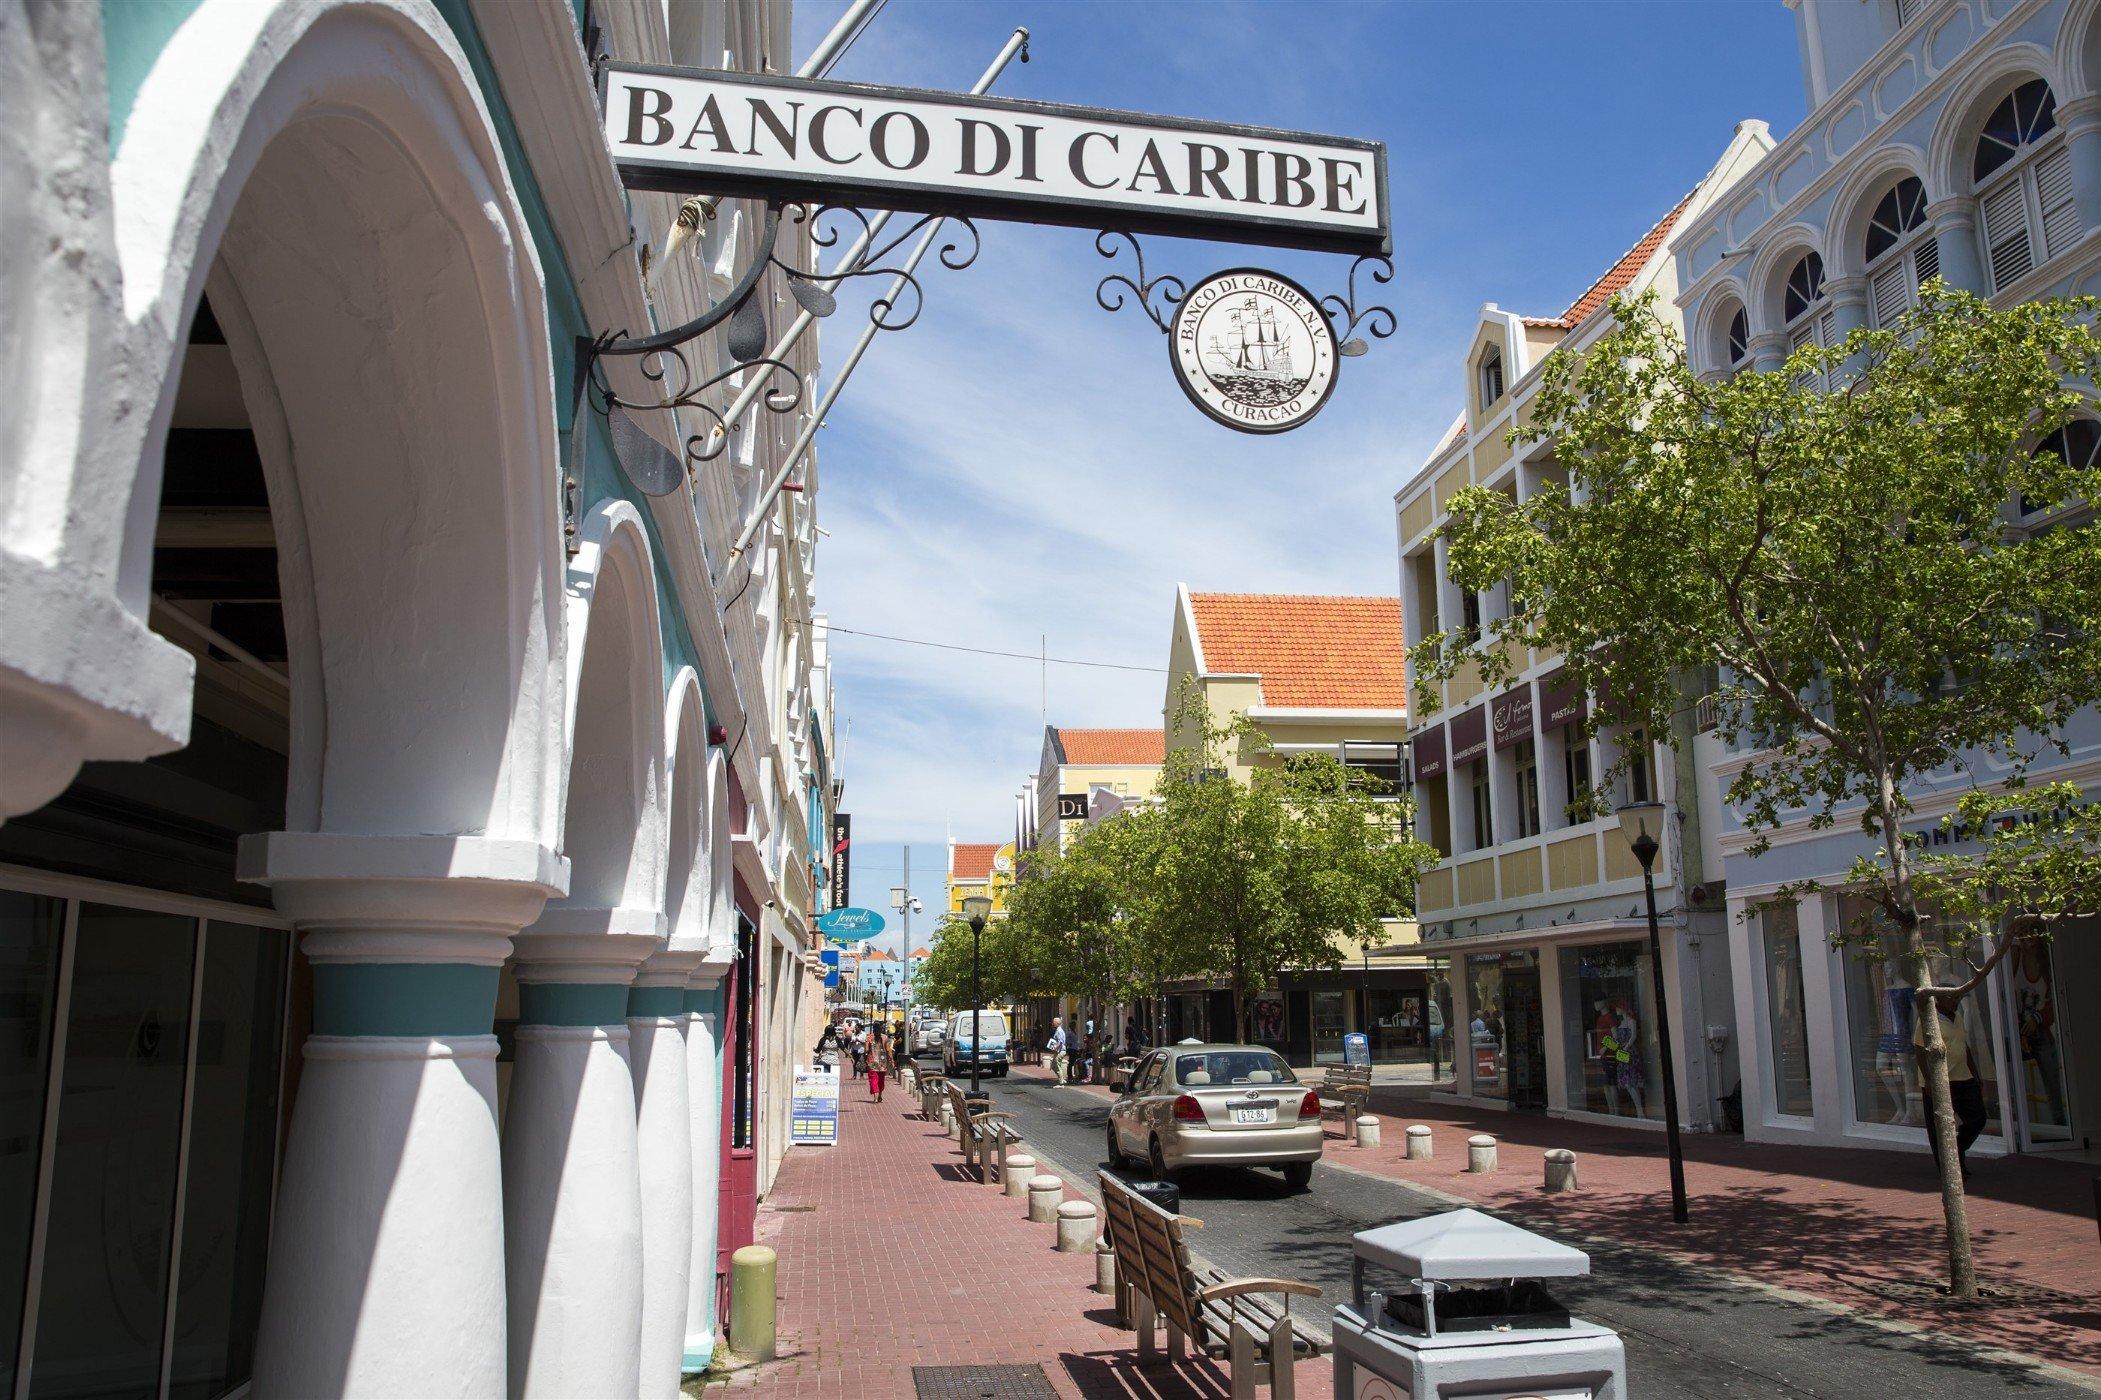 PBC   Banco di Caribe in de verkoop